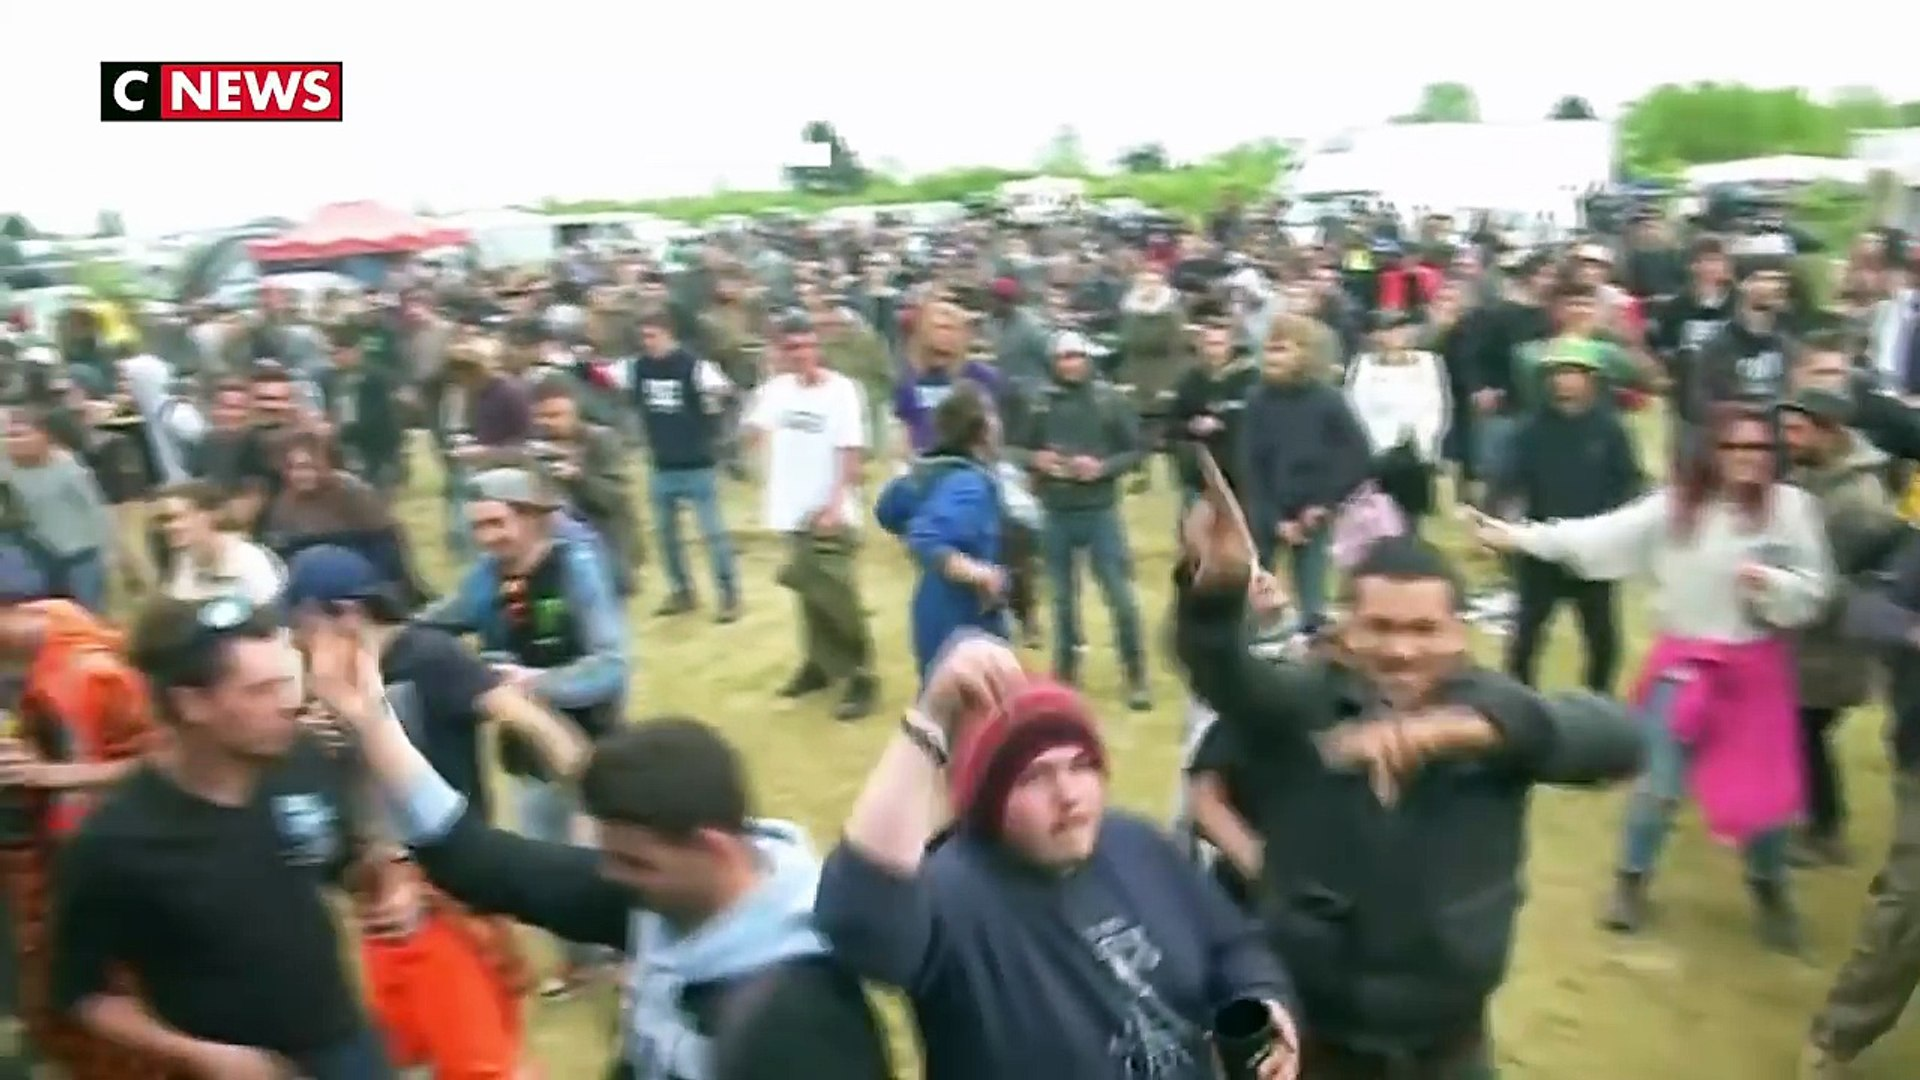 25 ème Teknival du 1er Mai à Marigny - Reportage CNEWS - 27/04/2018